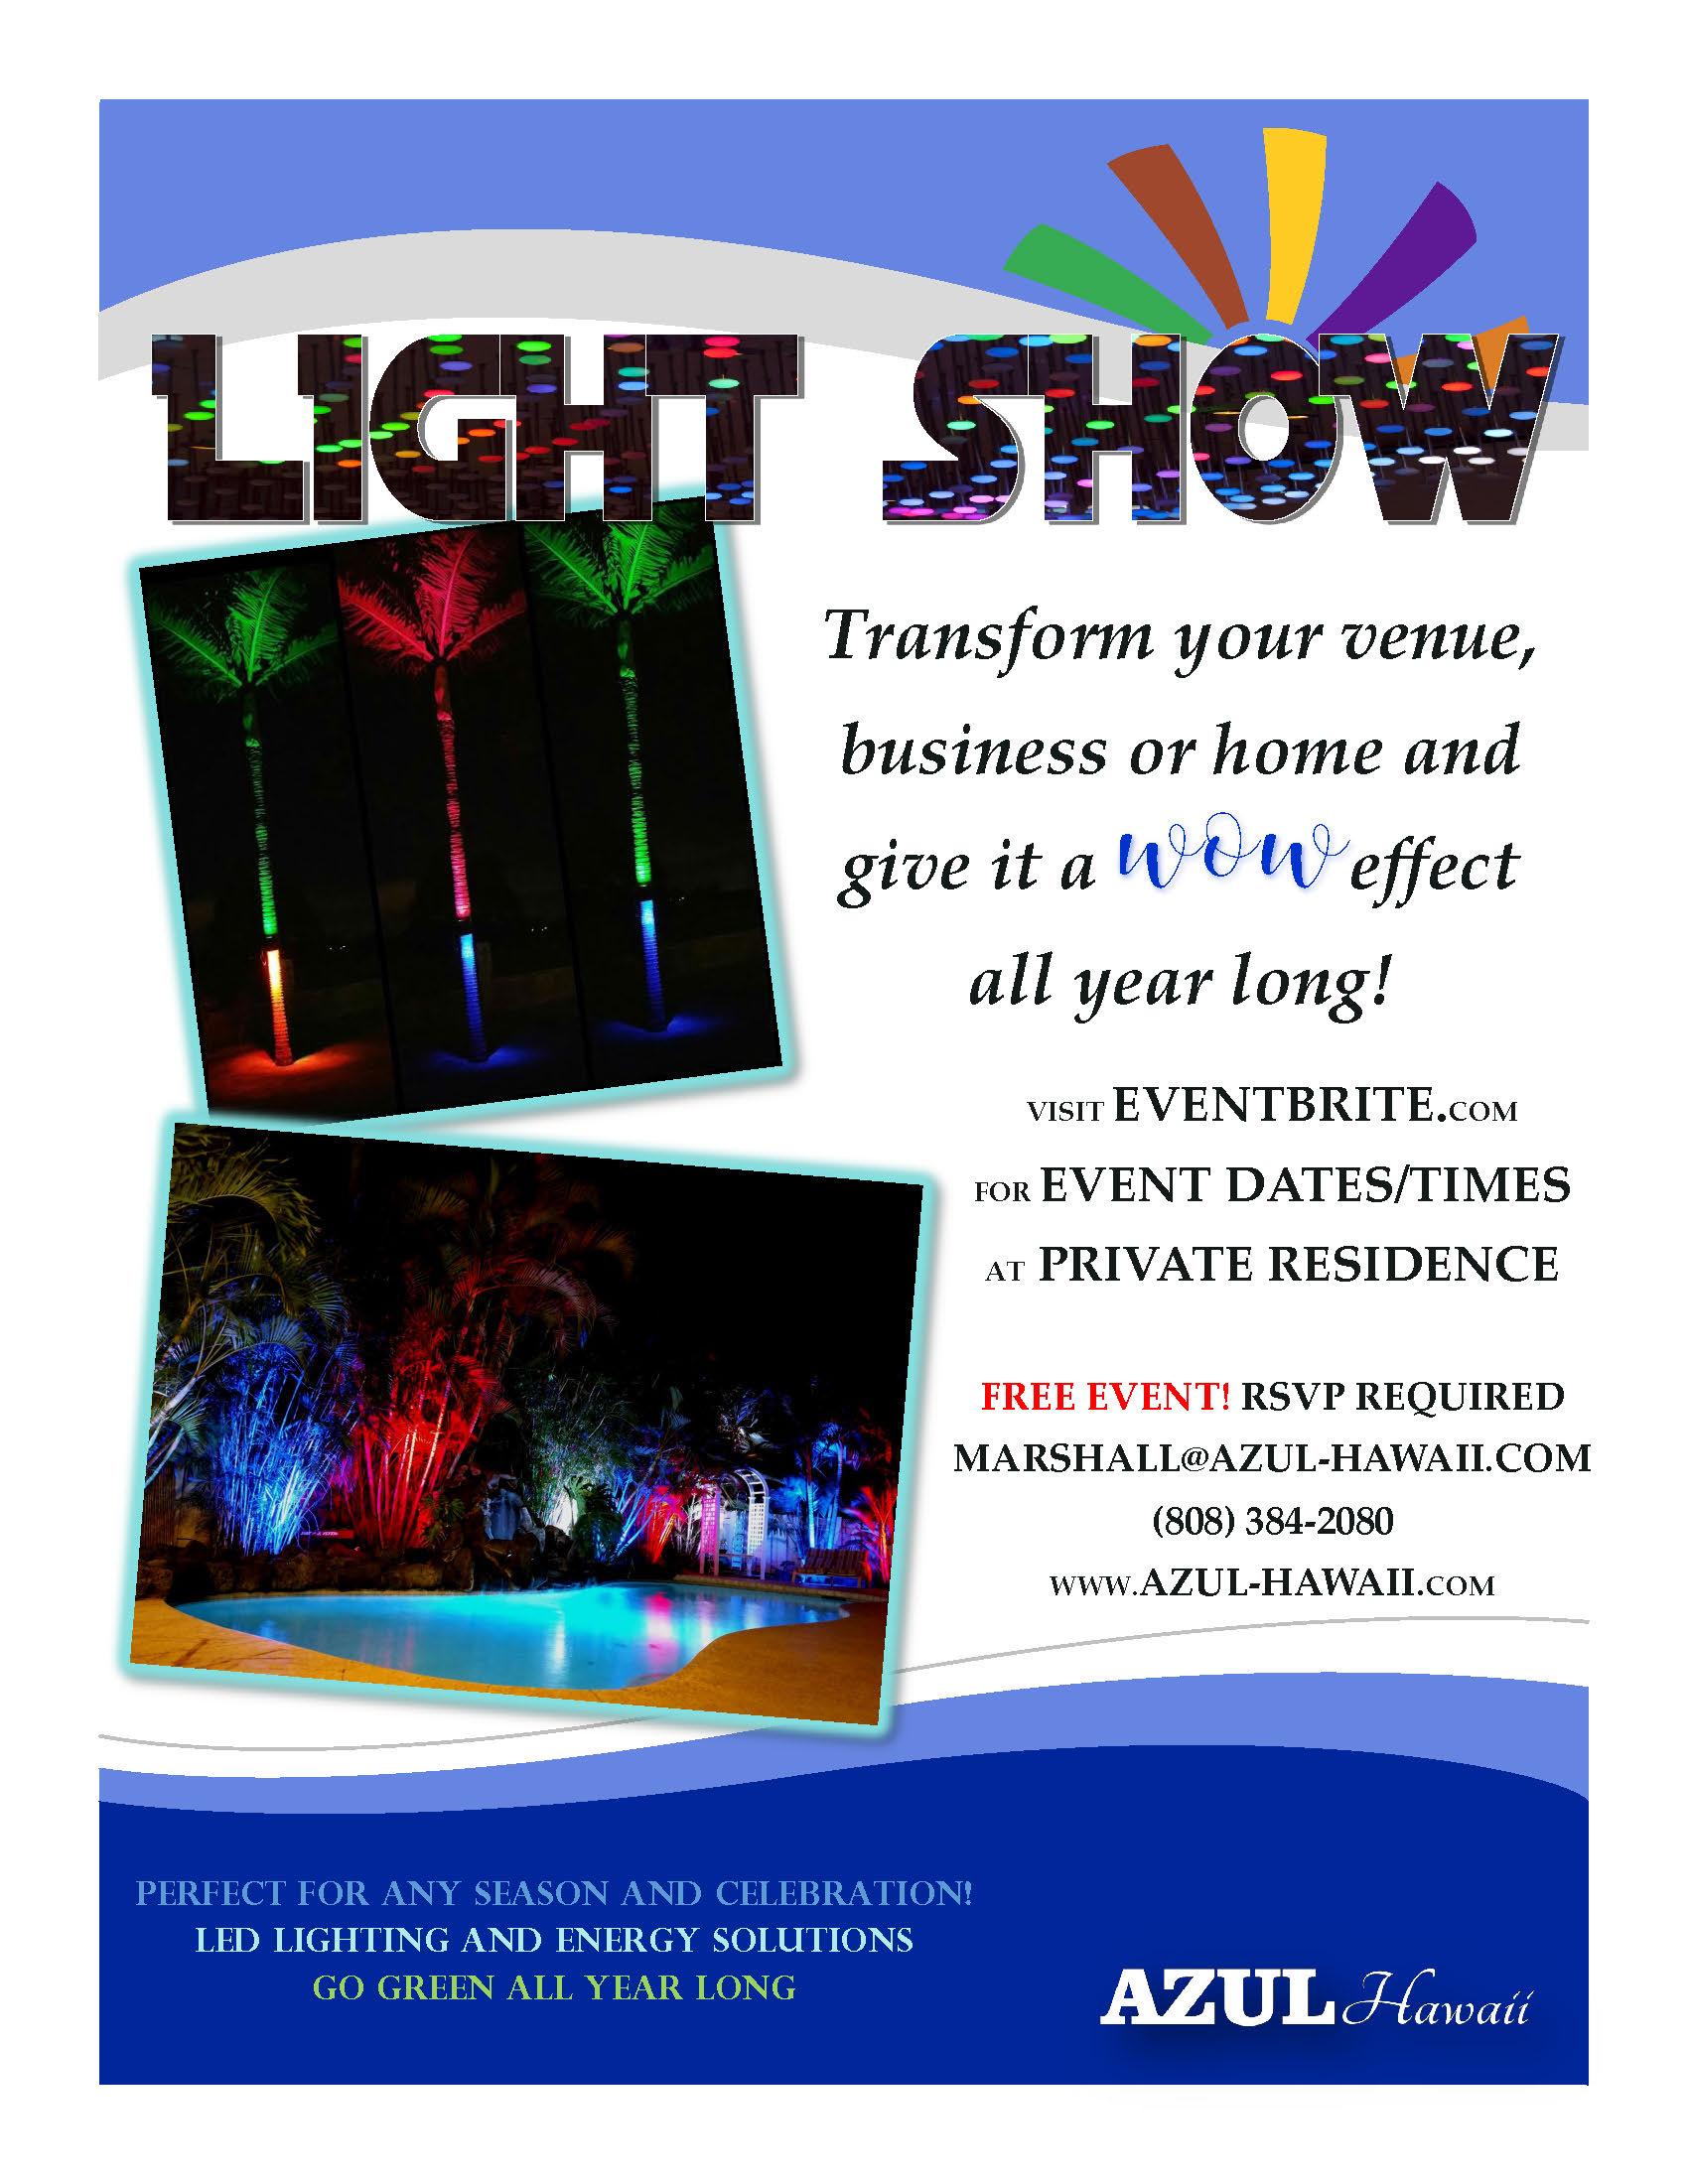 Azul Hawaii - Light Show